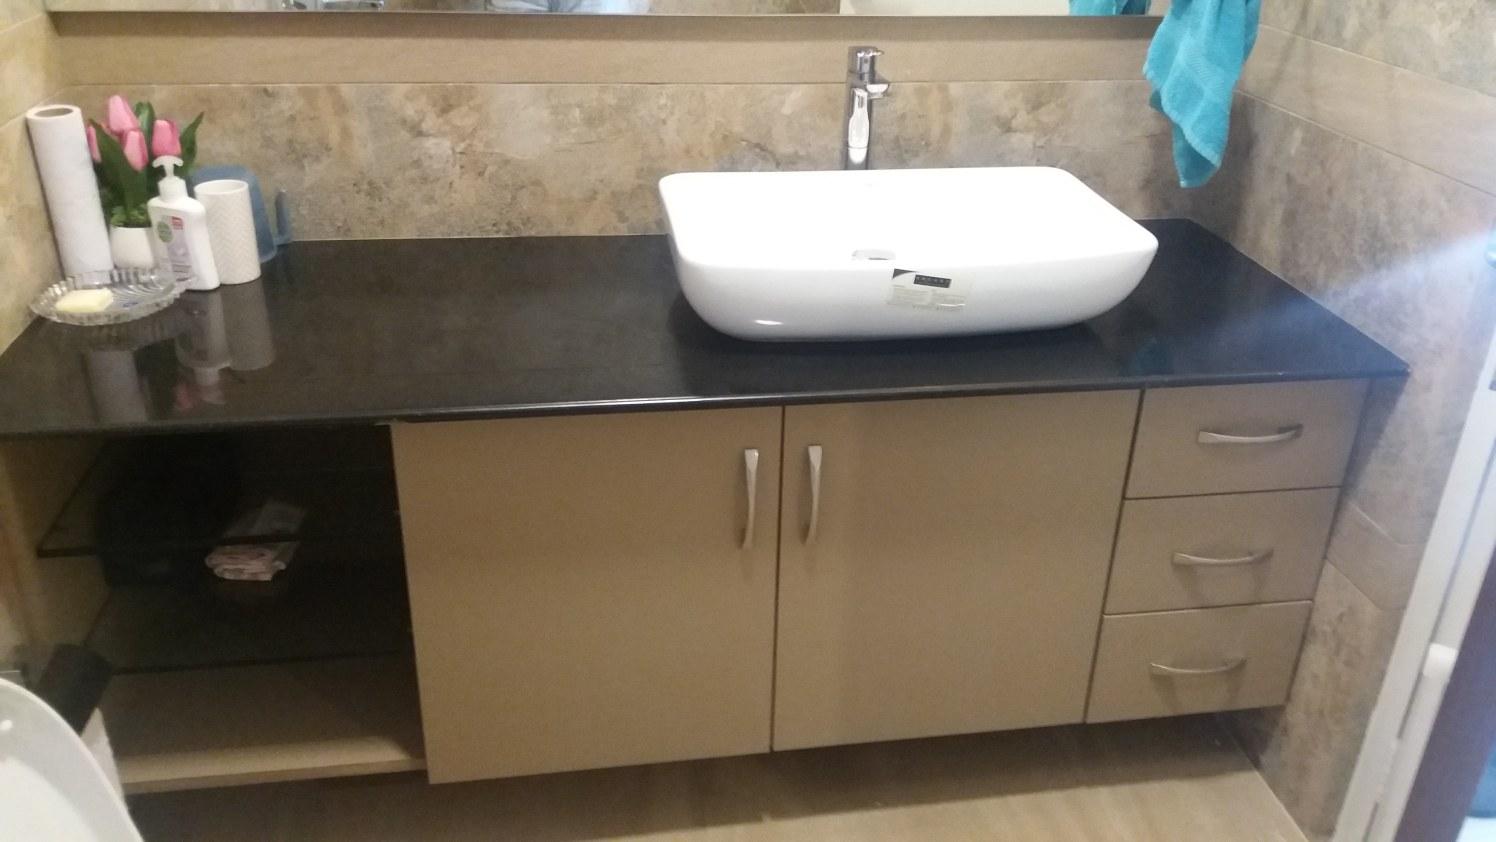 The washbasin by Global Associates Bathroom Minimalistic | Interior Design Photos & Ideas